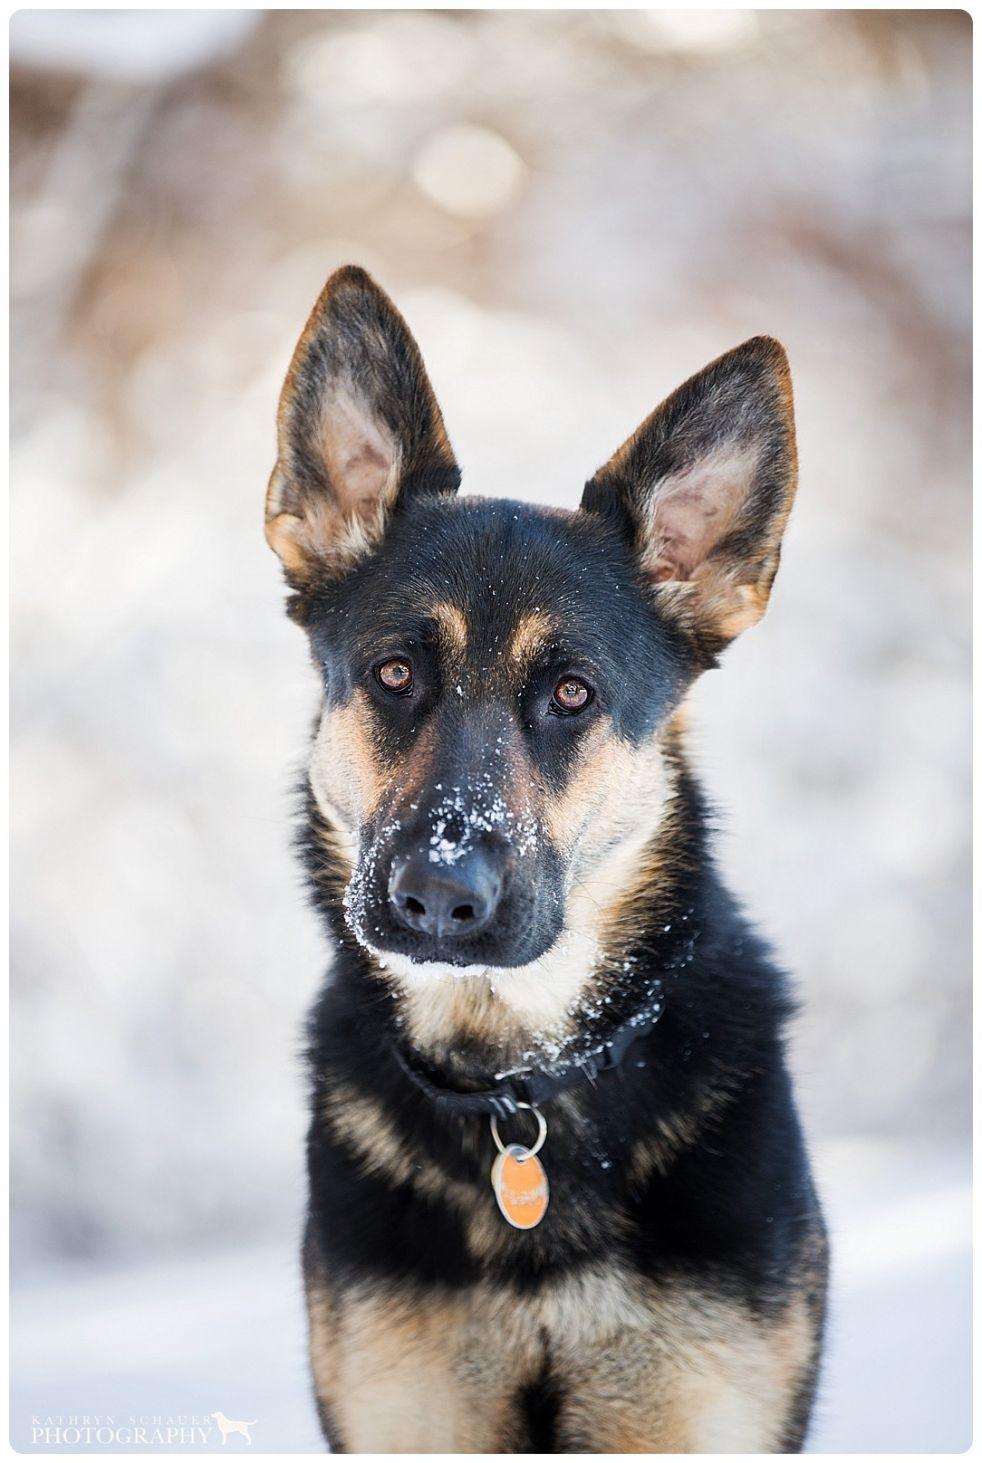 CT Pet Photographers Keira (With images) Pet